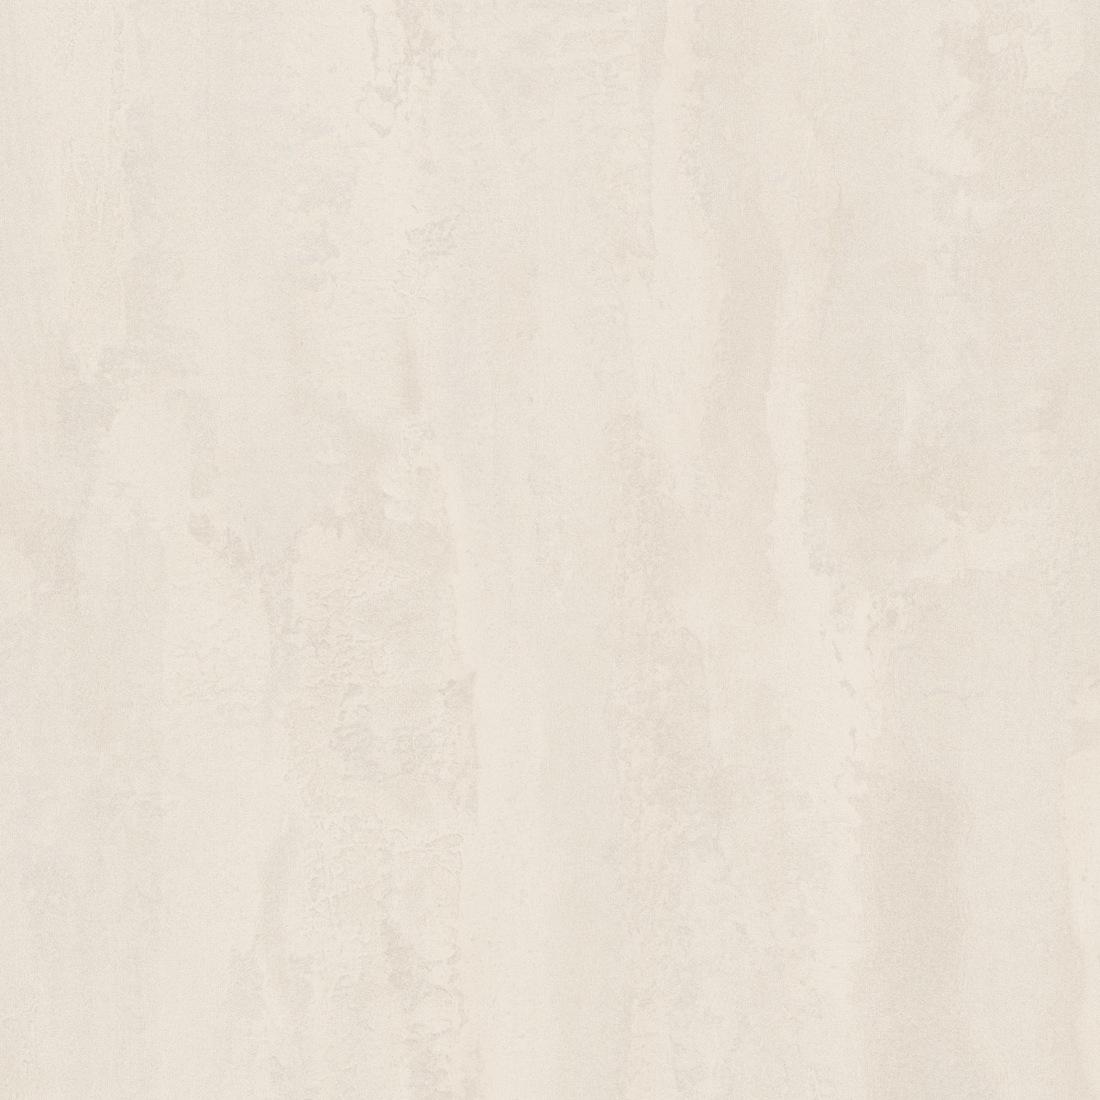 Pal melaminat Kronospan, Matase K349 RT, 2800 x 2070 x 18 mm imagine MatHaus.ro